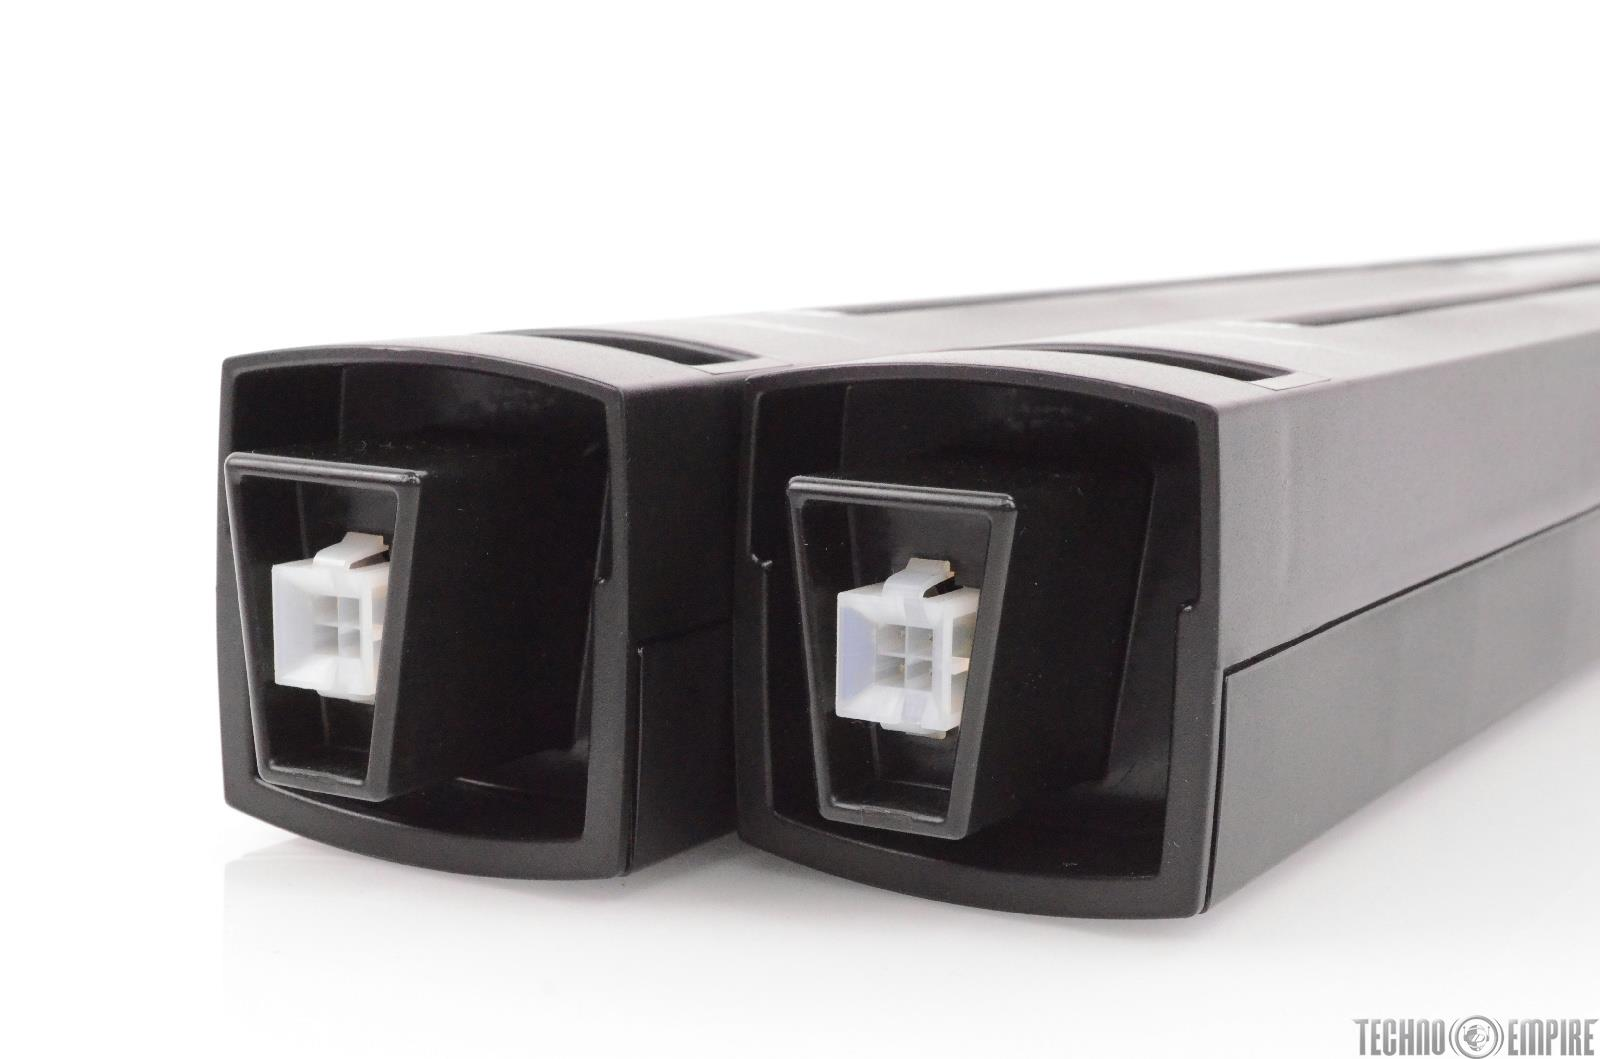 bose l1 compact portable line array system compact pa unit 27951 ebay. Black Bedroom Furniture Sets. Home Design Ideas